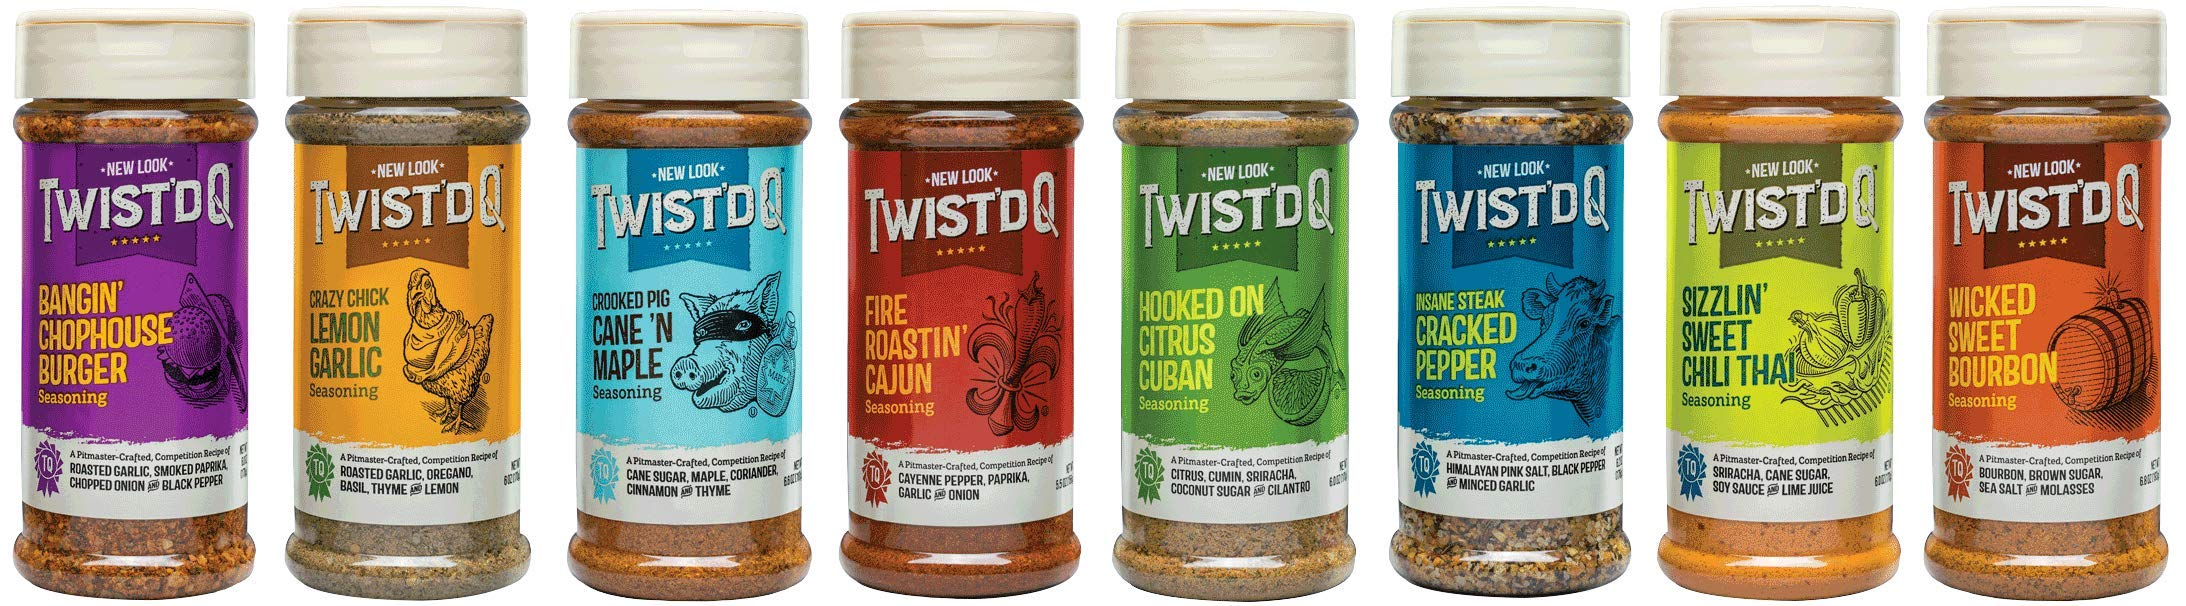 Twist'd Q Extreme 8 Pack Seasoning Gift Box Set by Twist'd Q (Image #2)